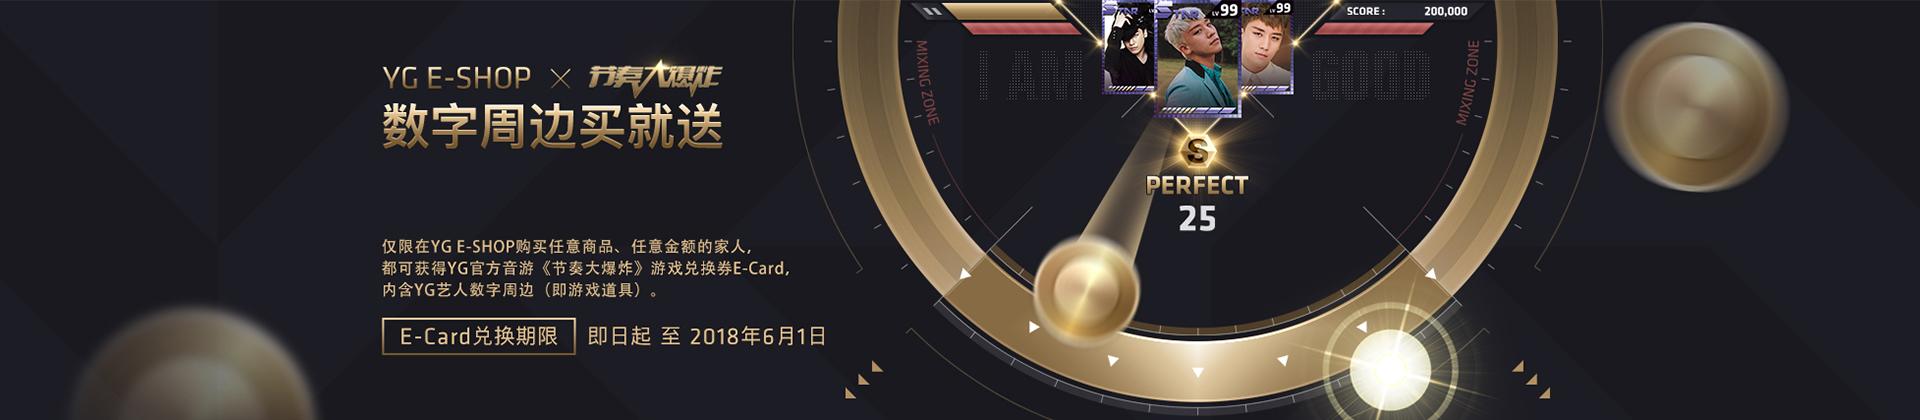 YG E-SHOP × 节奏大爆炸 数字周边买就送